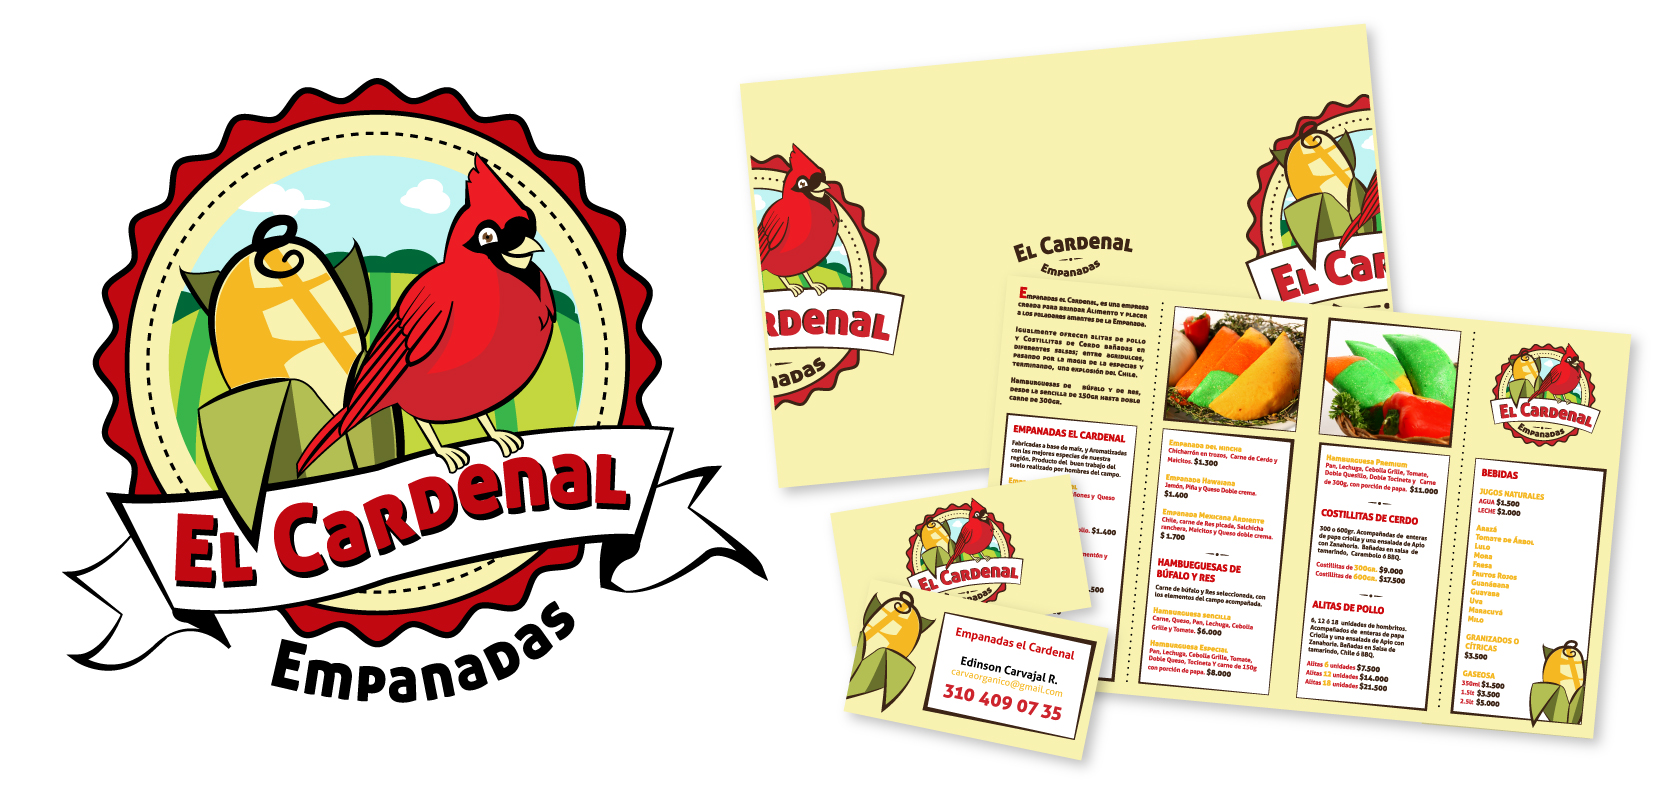 El Cardenal Branding